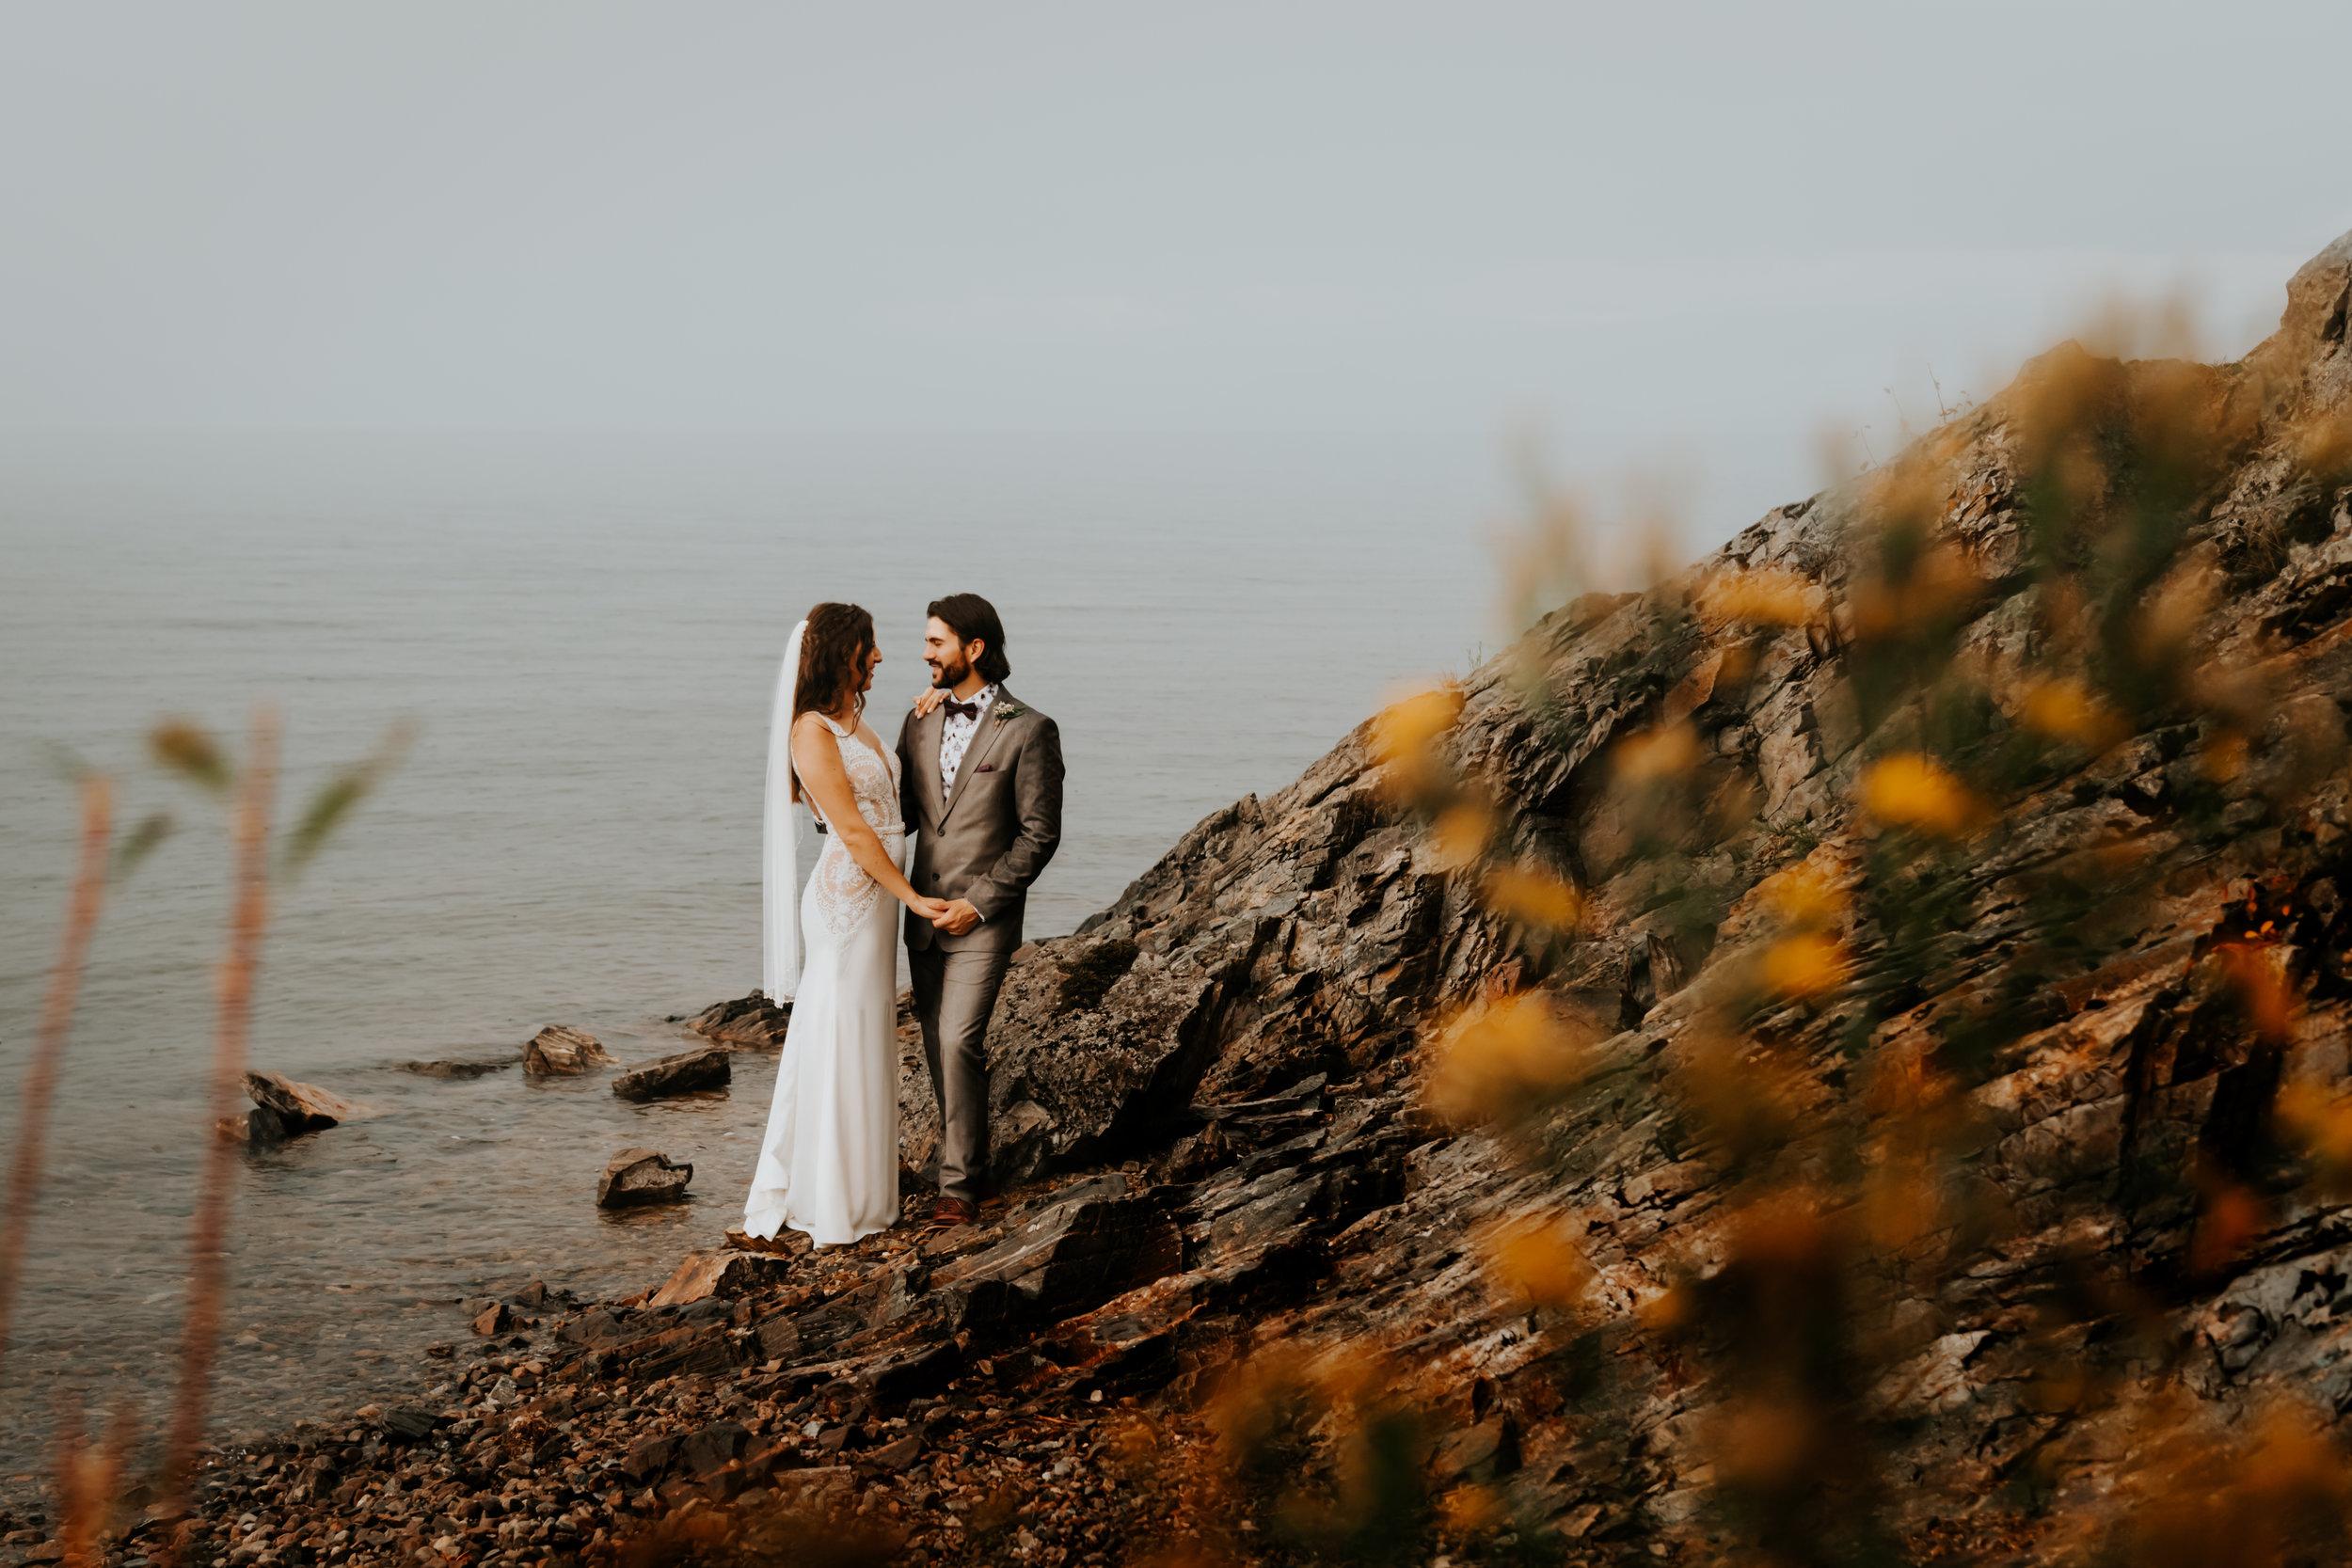 kelowna-wedding-photographer-26.jpg